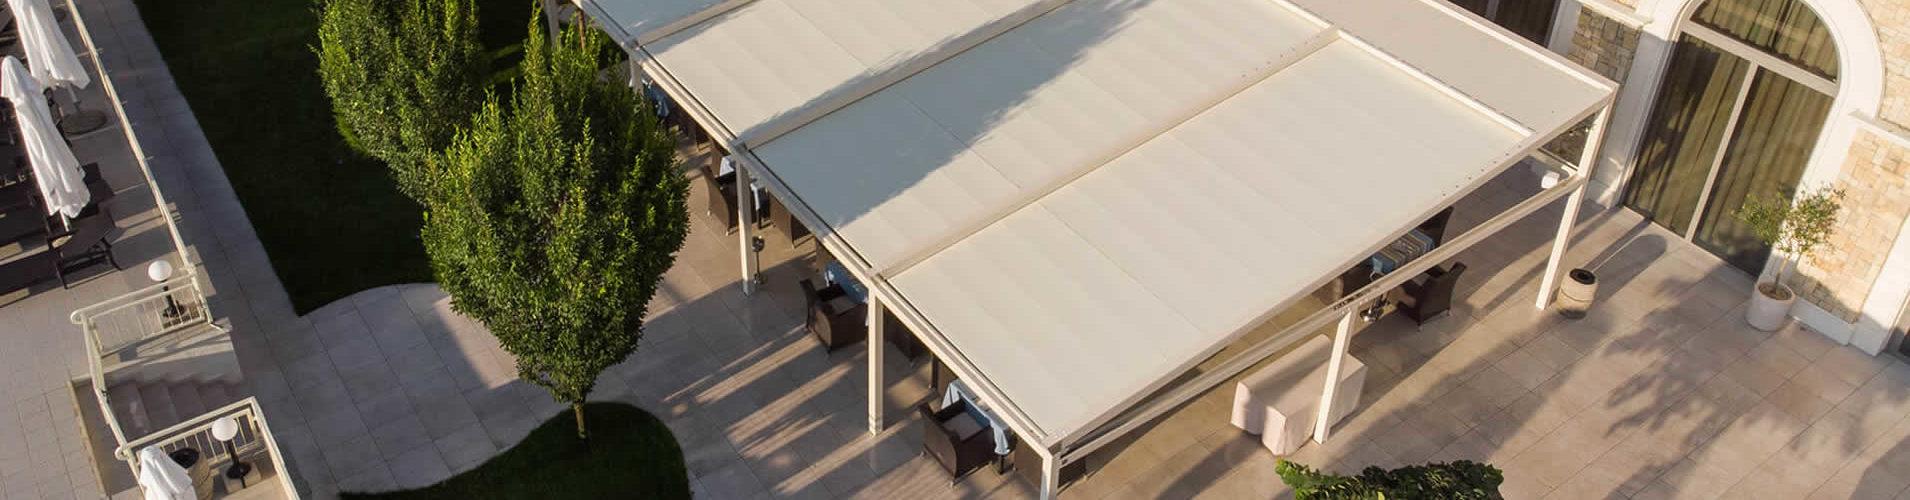 retractable roofs sarasota naples